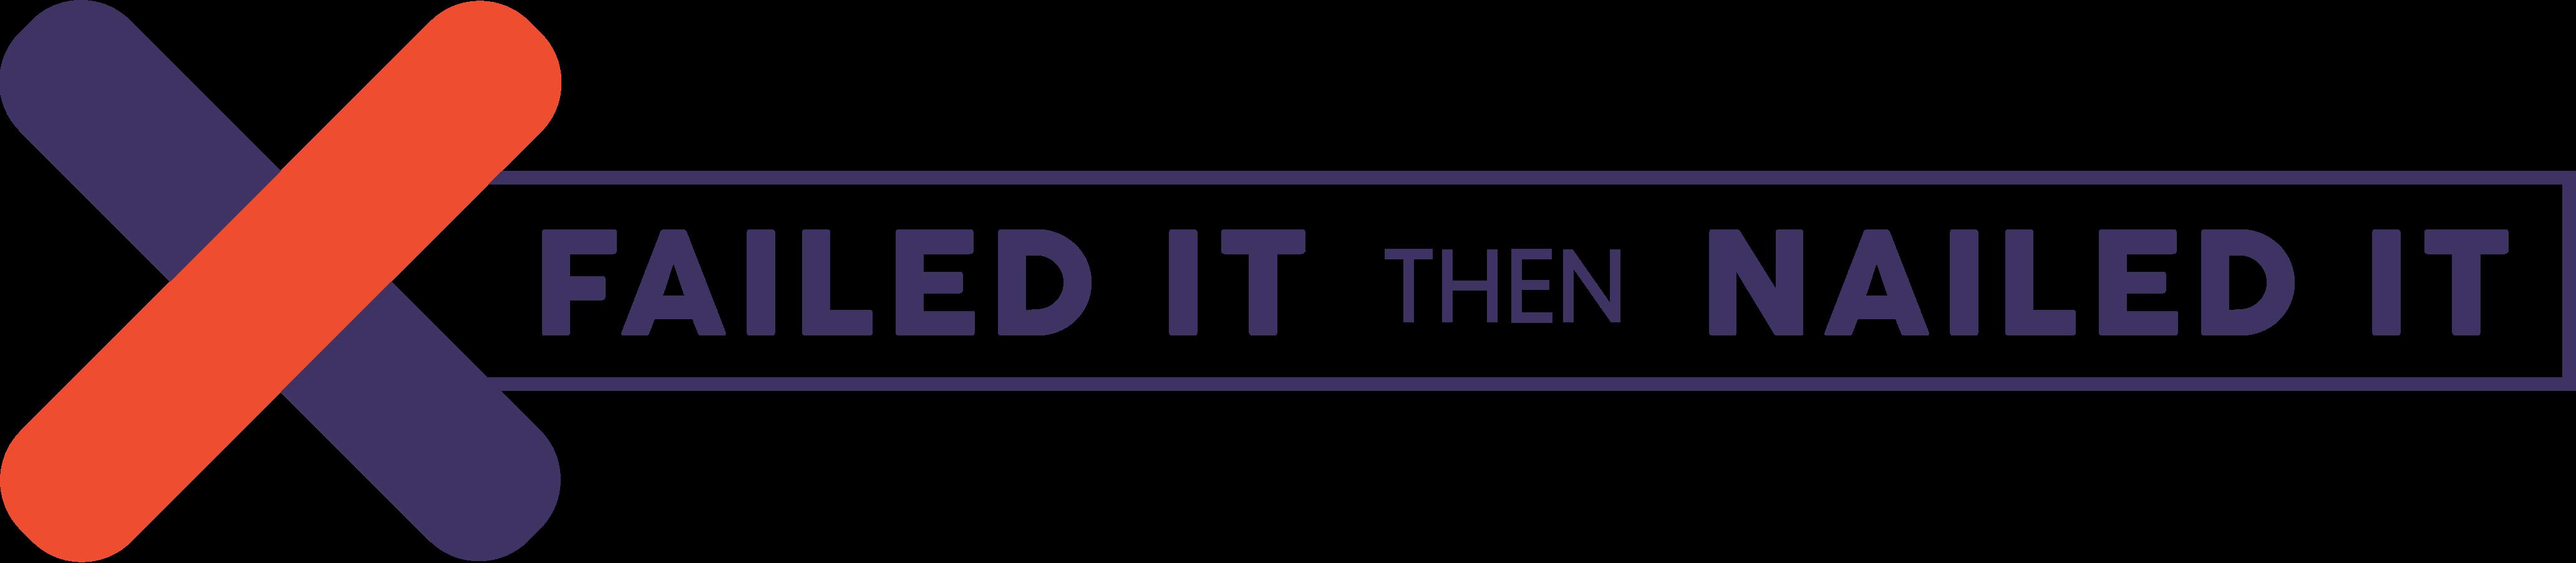 Failed it then Nailed it logo